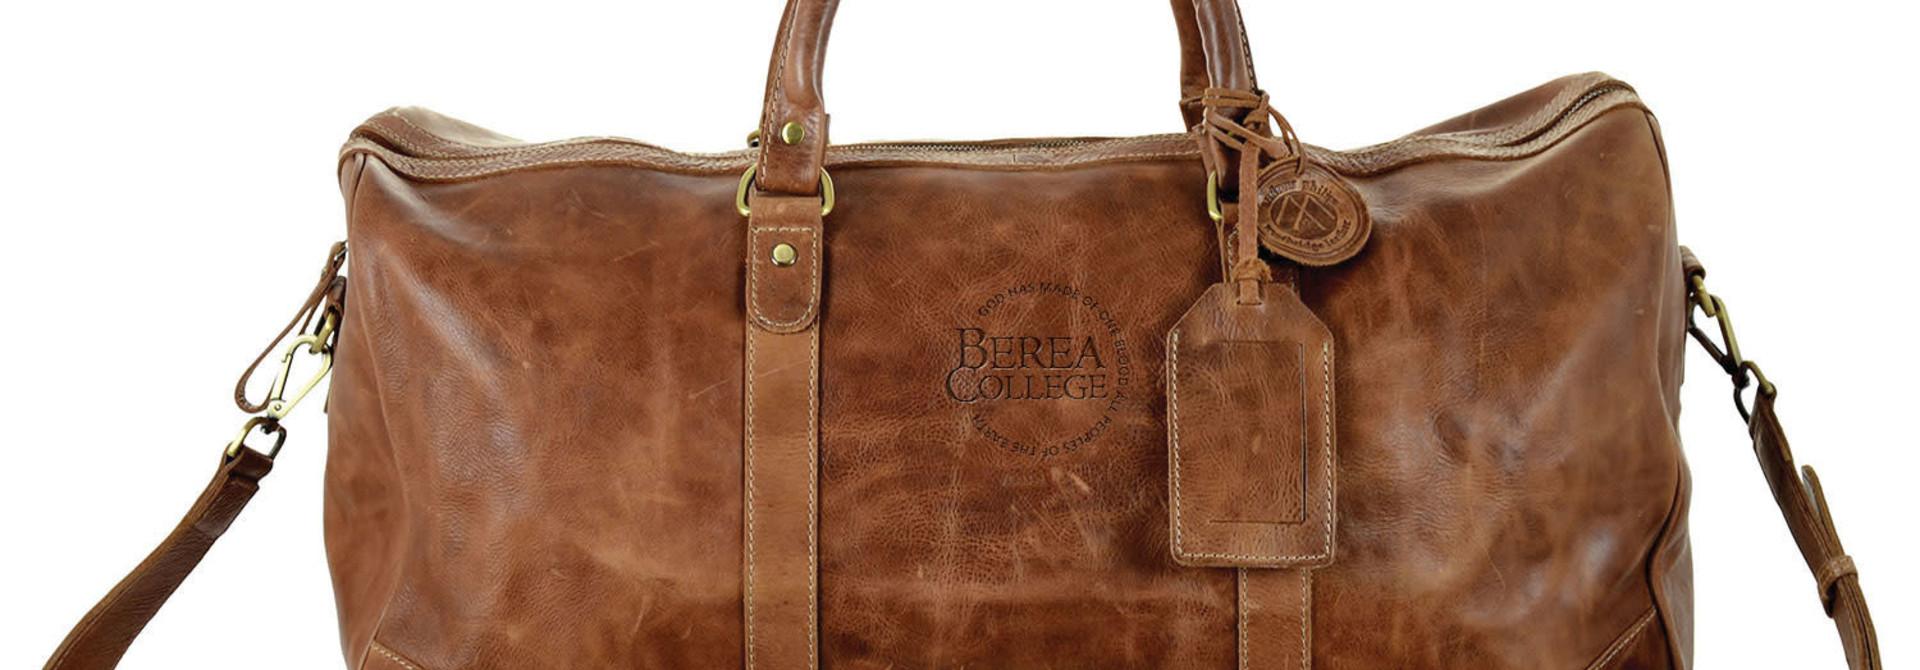 Westbridge Large Leather Duffel